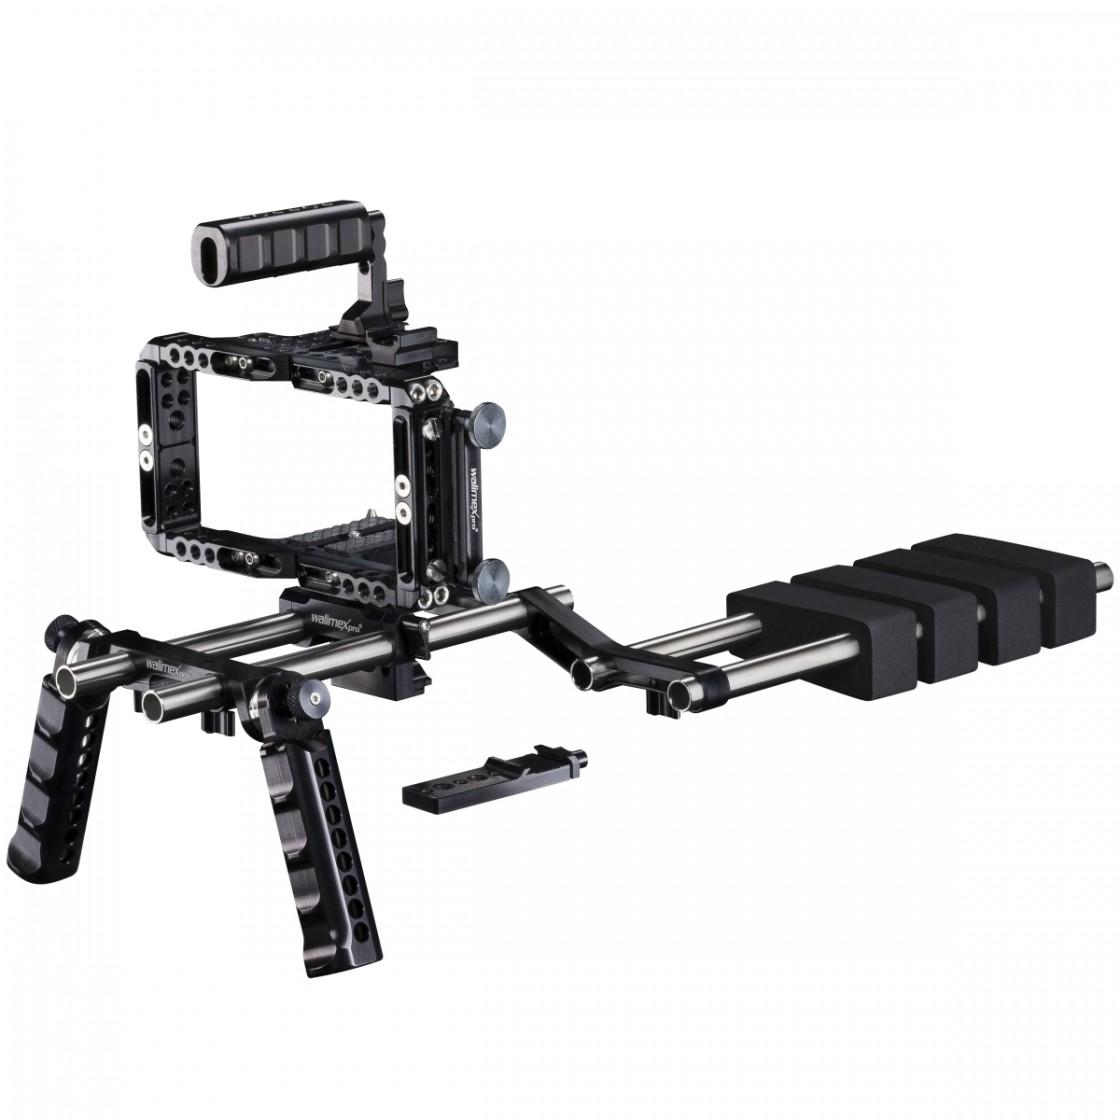 20% Rabatt auf Walimex pro Aptaris Artikel: z.B. Walimex pro Aptaris Frame Action Set (Kamera-Rig)